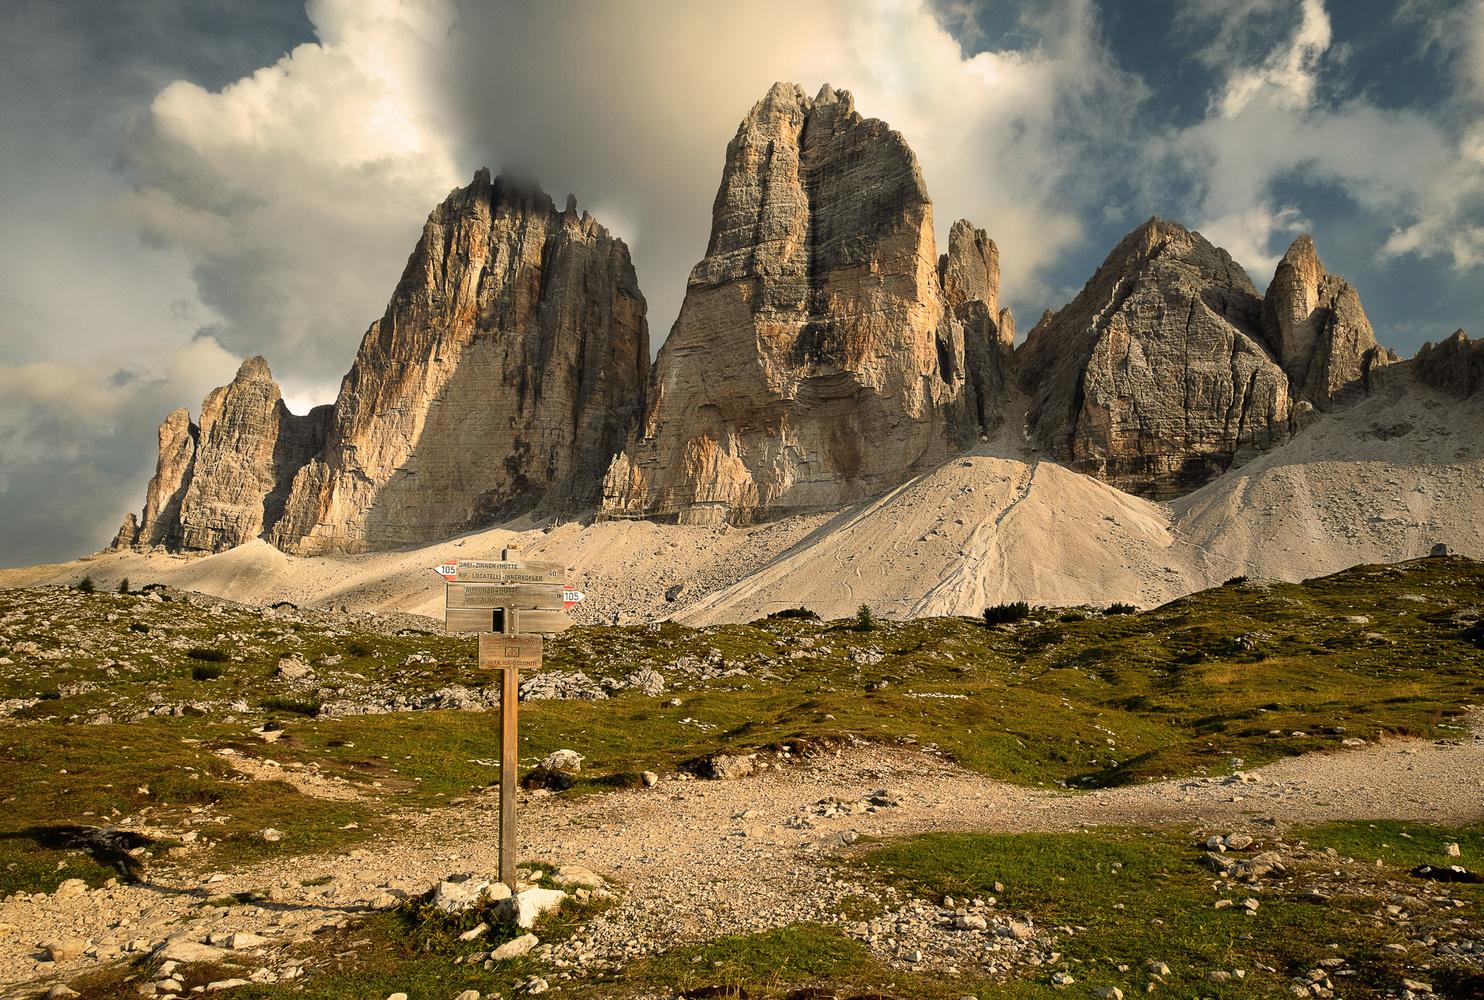 Three Mountains by Thomas Schwinn